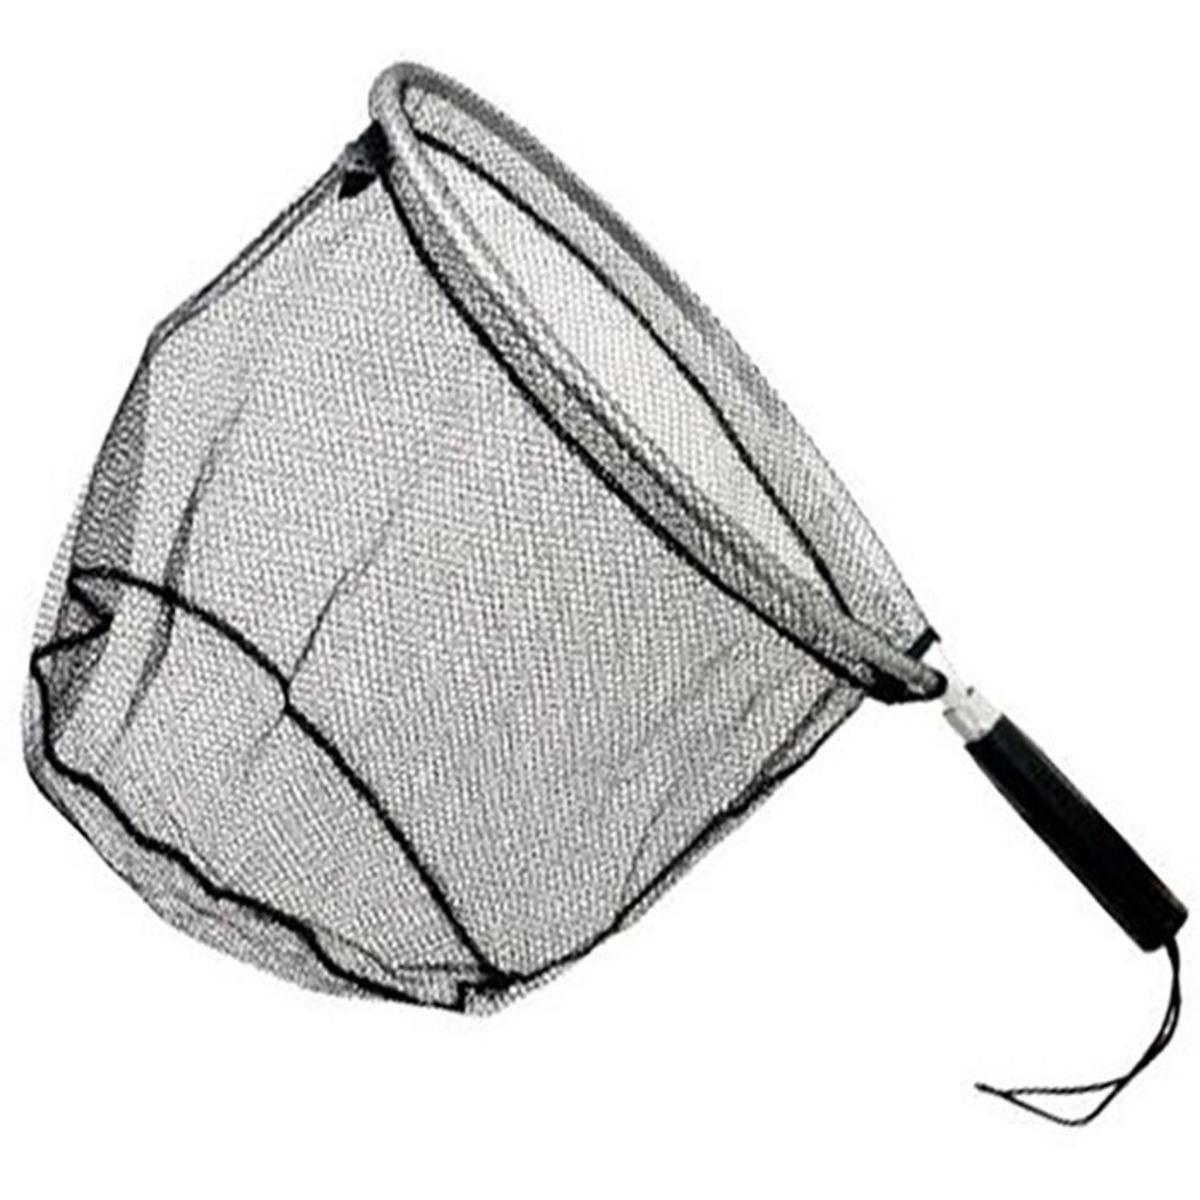 Zebco Trout Gripper - 55x30x37x30 cm - 5x5 mm